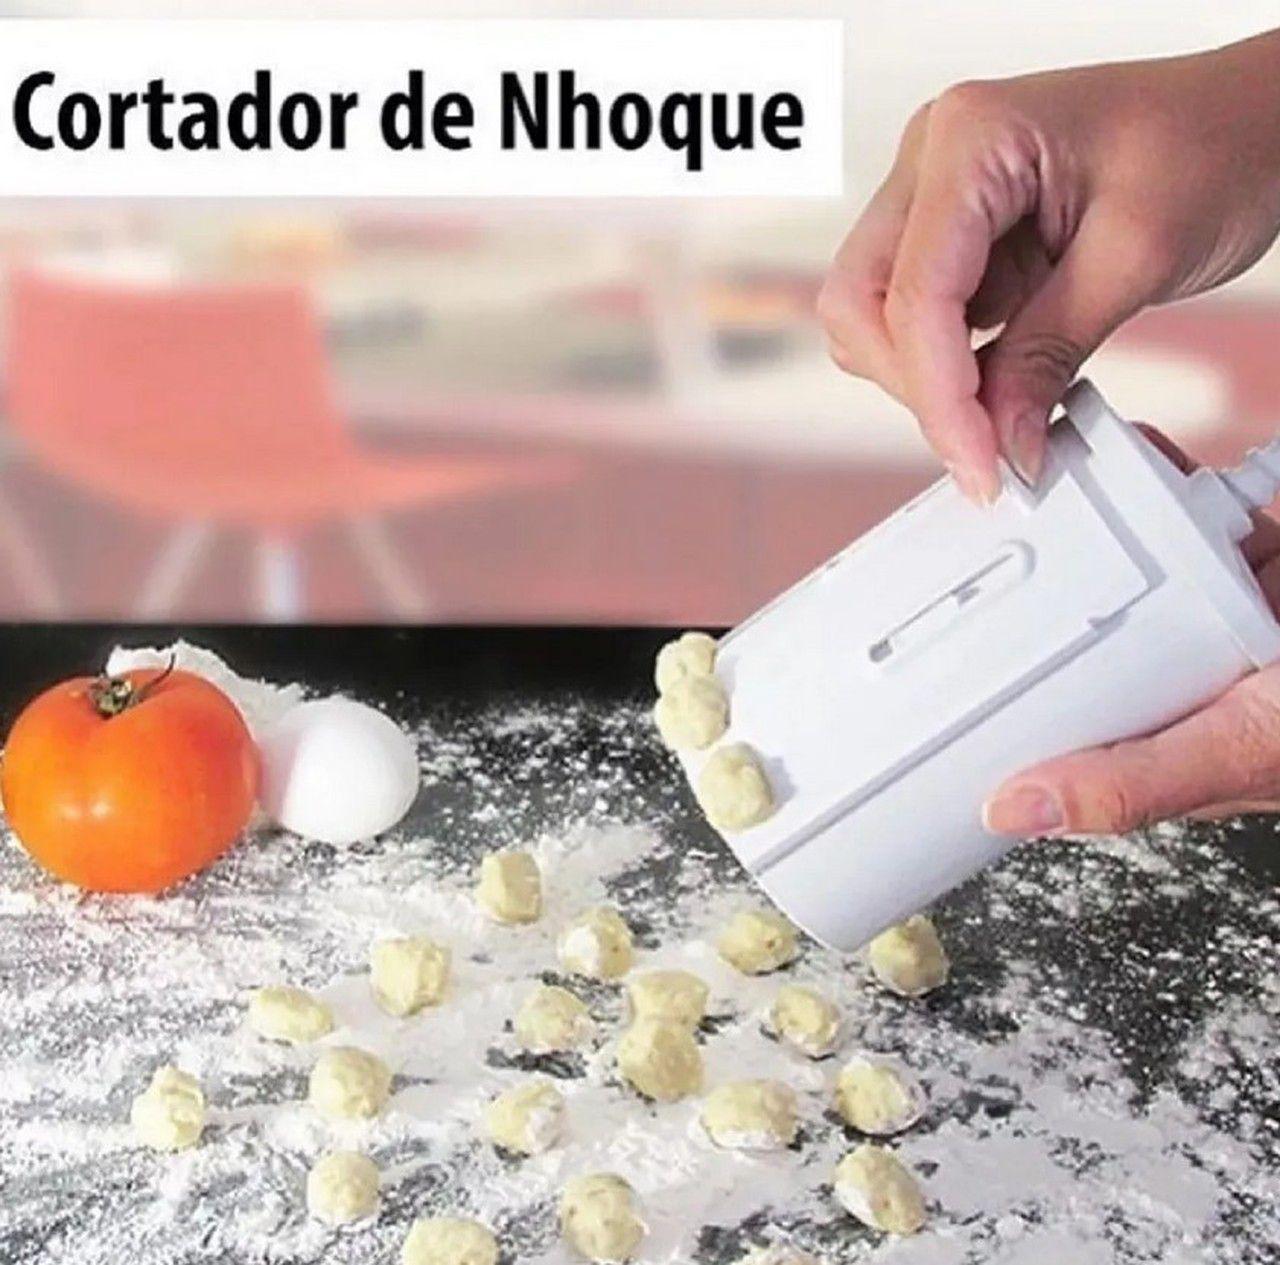 Máquina Manual Cortador Nhoque C/ Escorredor & Brindes